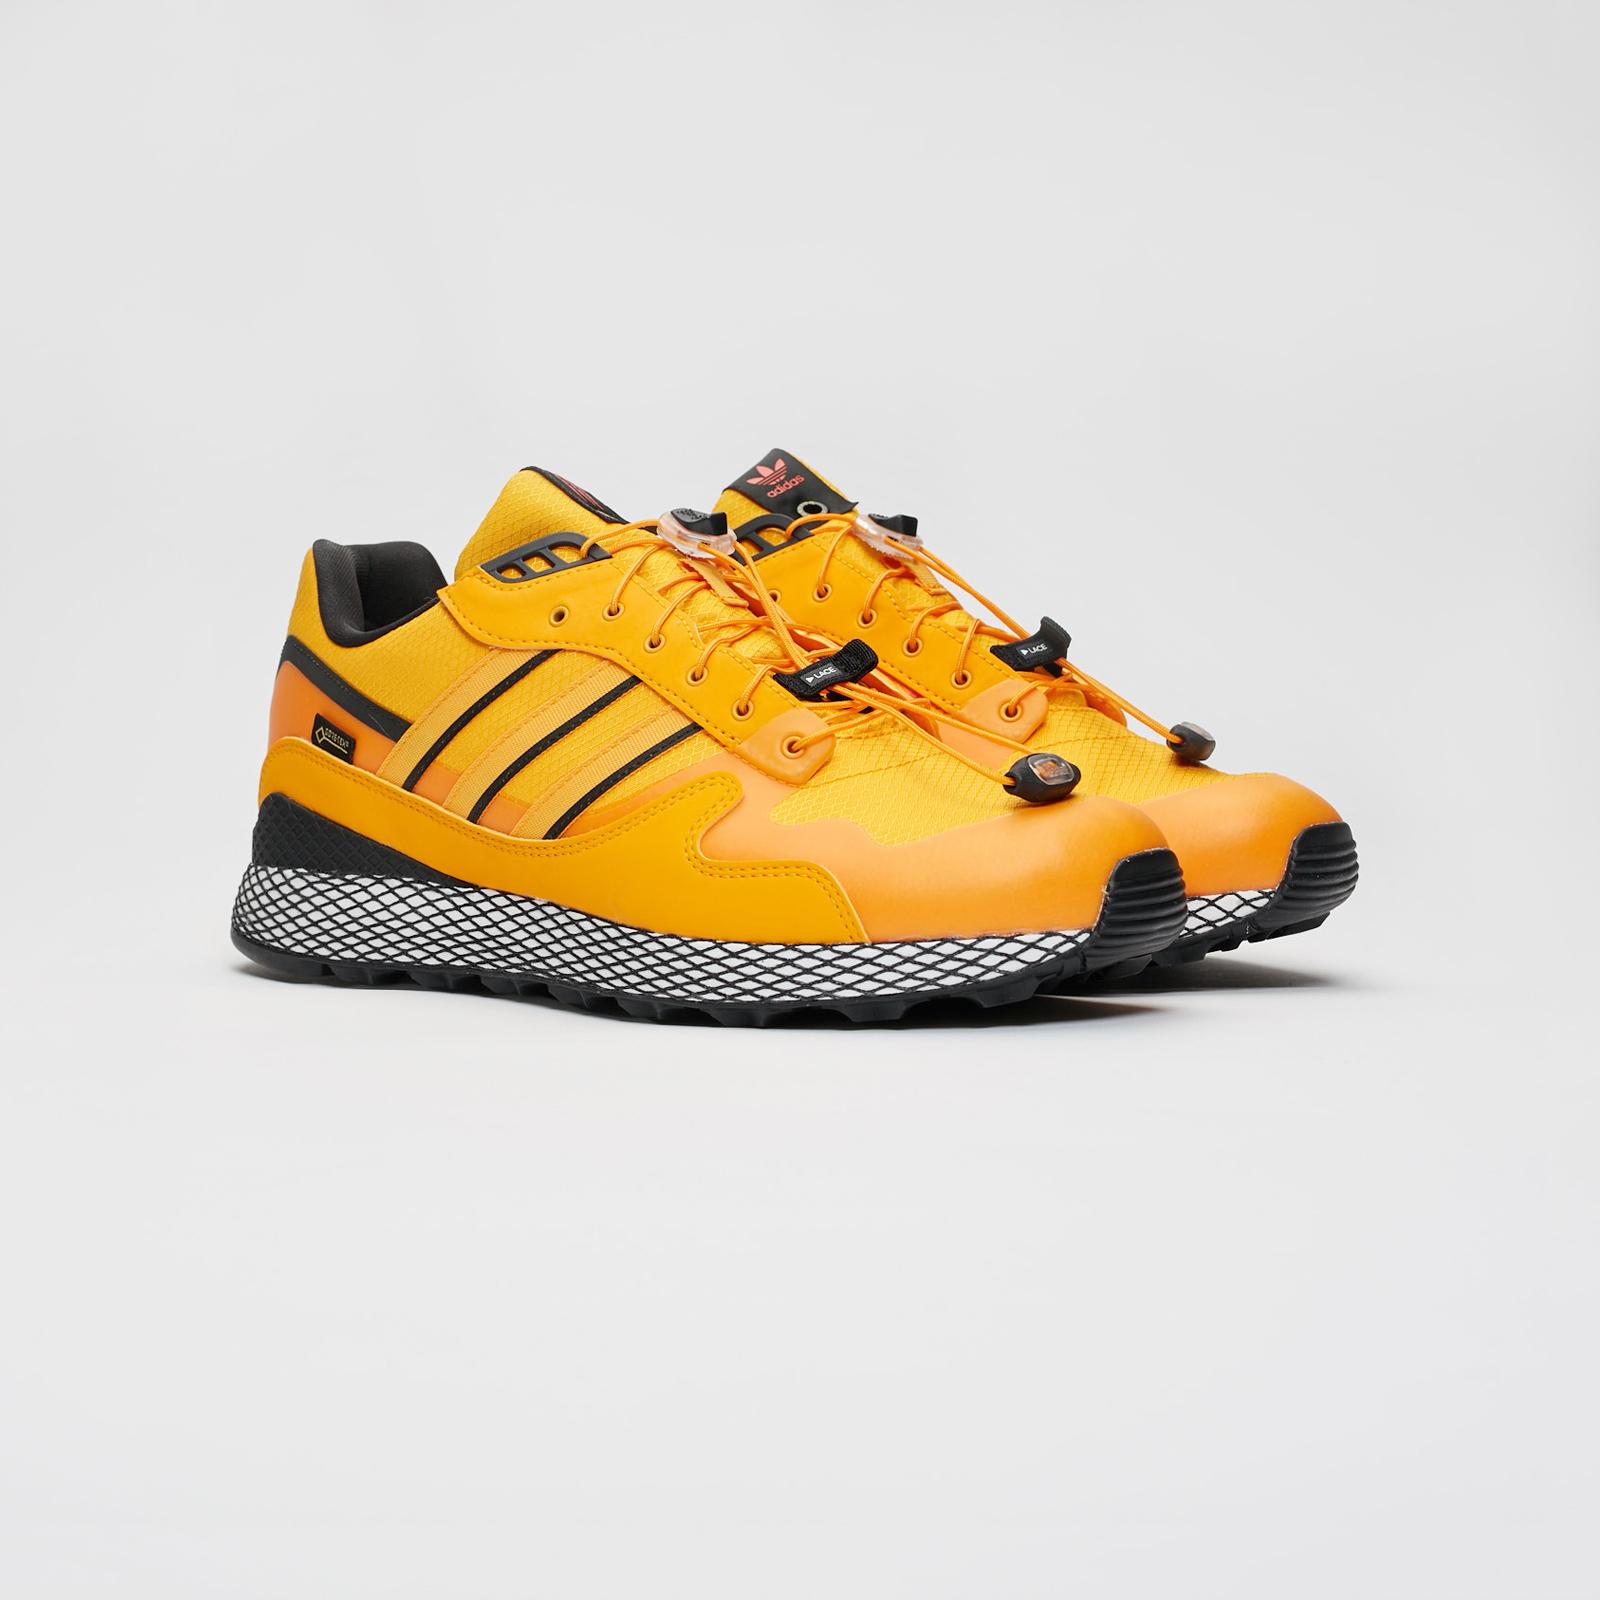 852239c5d adidas Ultra Tech GORE-TEX LIVESTOCK - B37852 - Sneakersnstuff ...